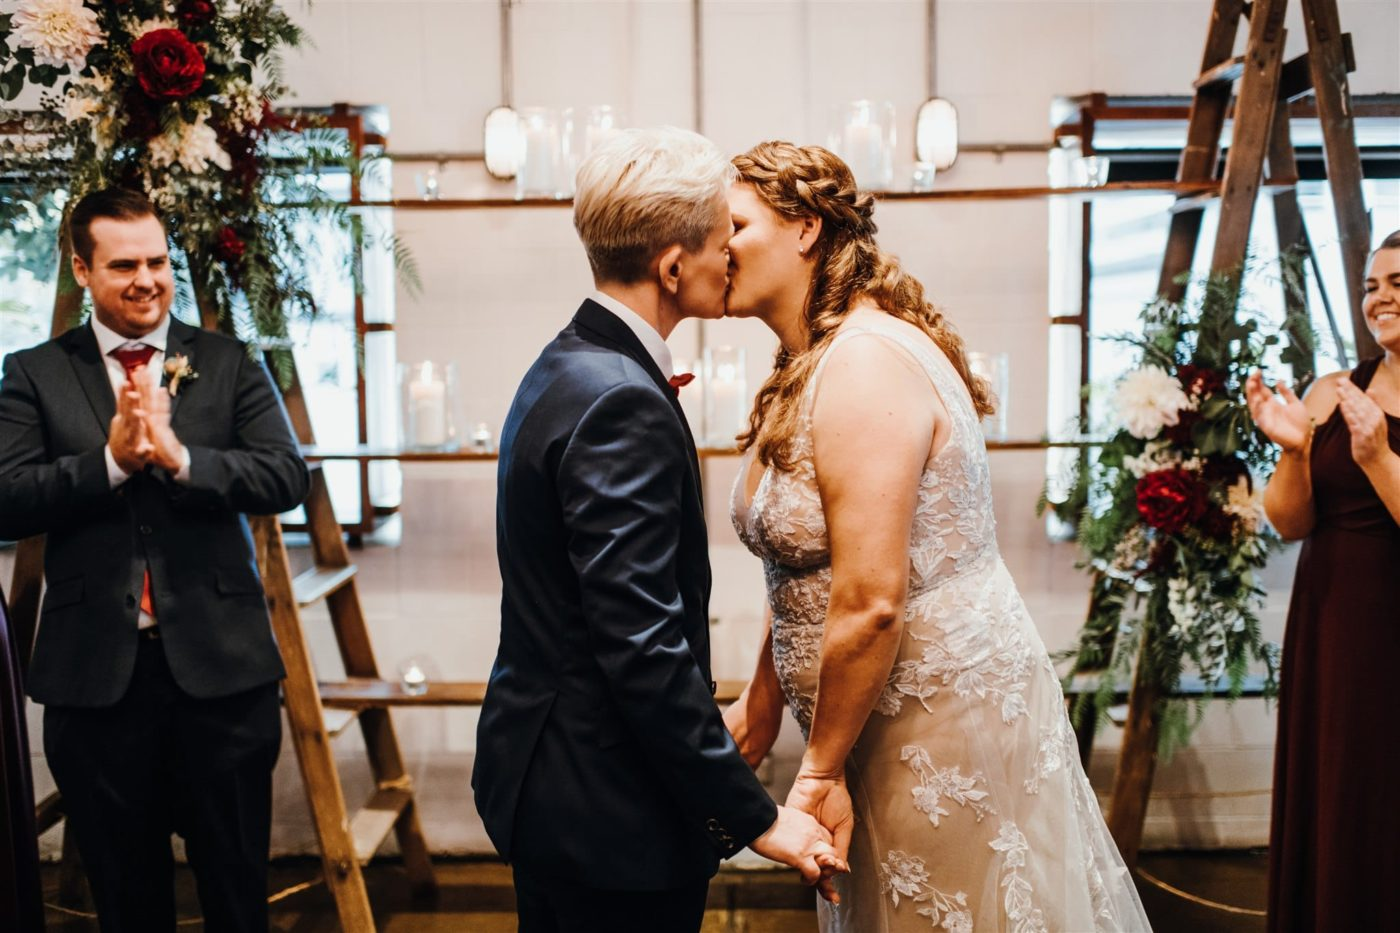 Same-Sex Wedding Inspiration Morgan Roberts Photography Gold Coast Brisbane Queensland lesbian gay queer lgbt couple wedding photos Dancing With Her digital magazine